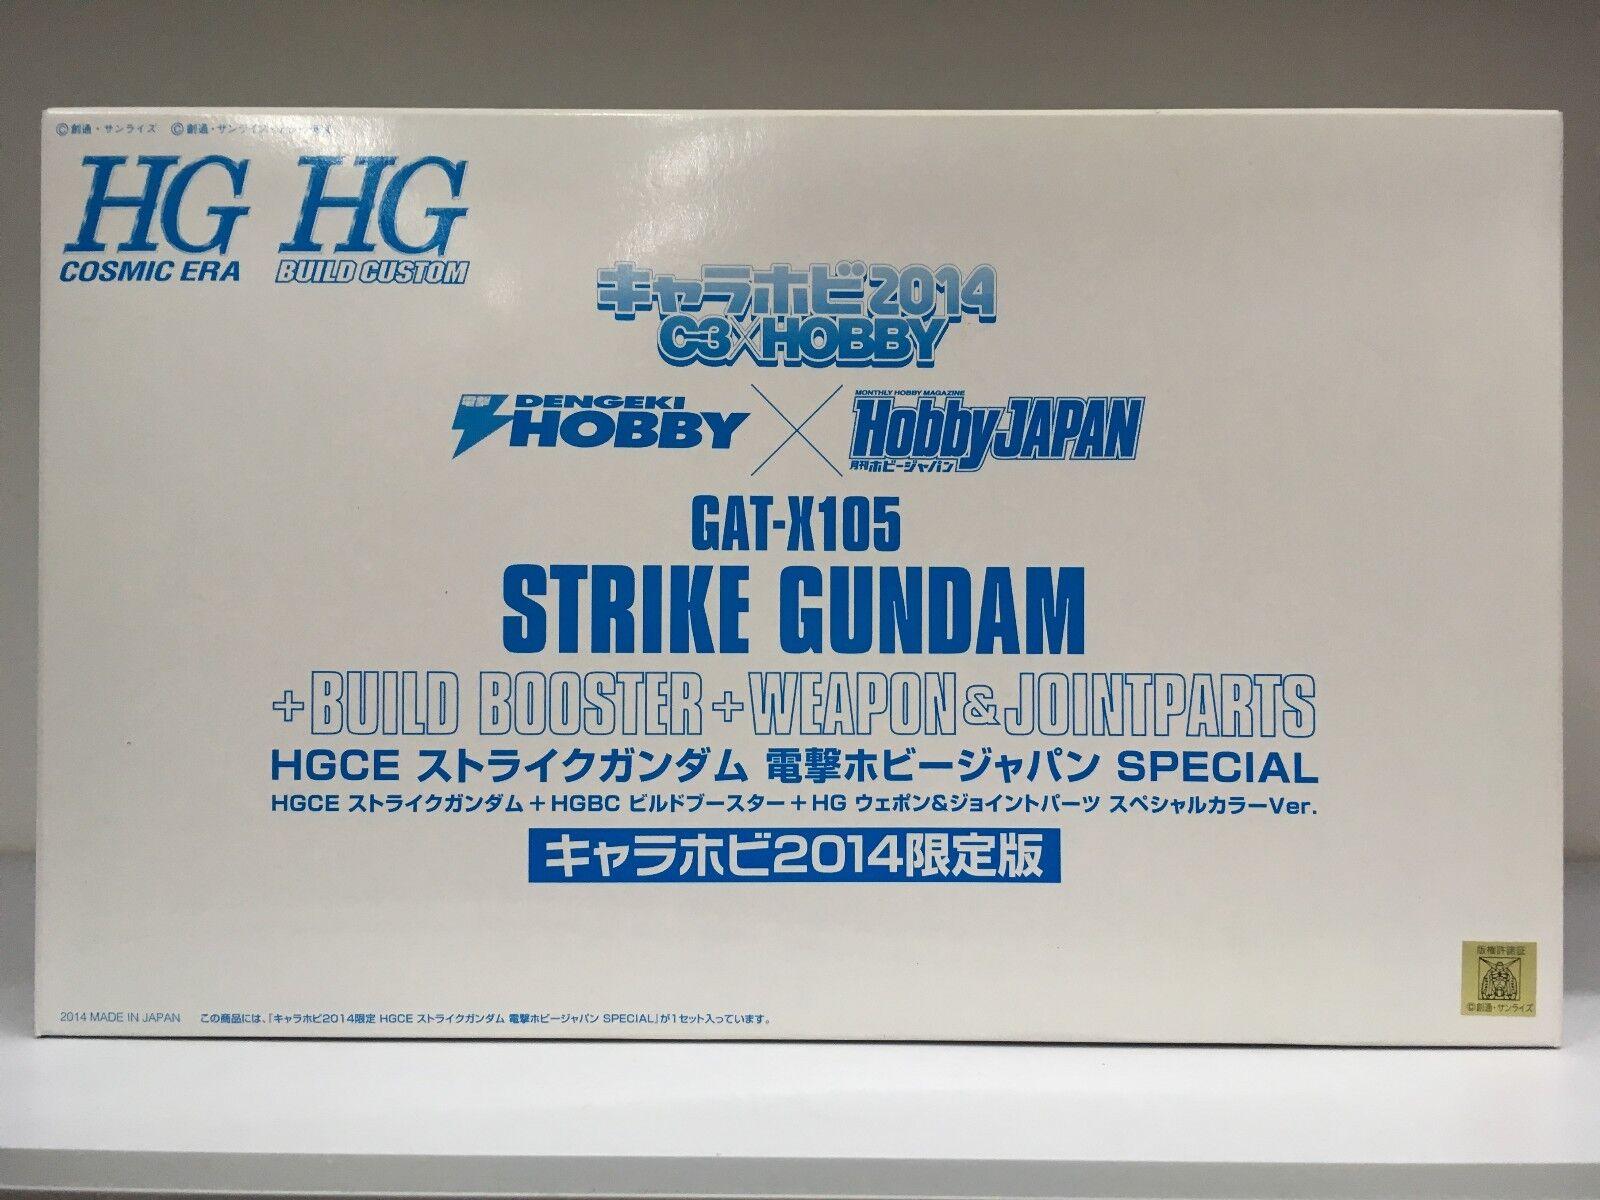 Bandai C3 Expo HGCE GAT -X105 Strike Gundam Bygg boostervapen